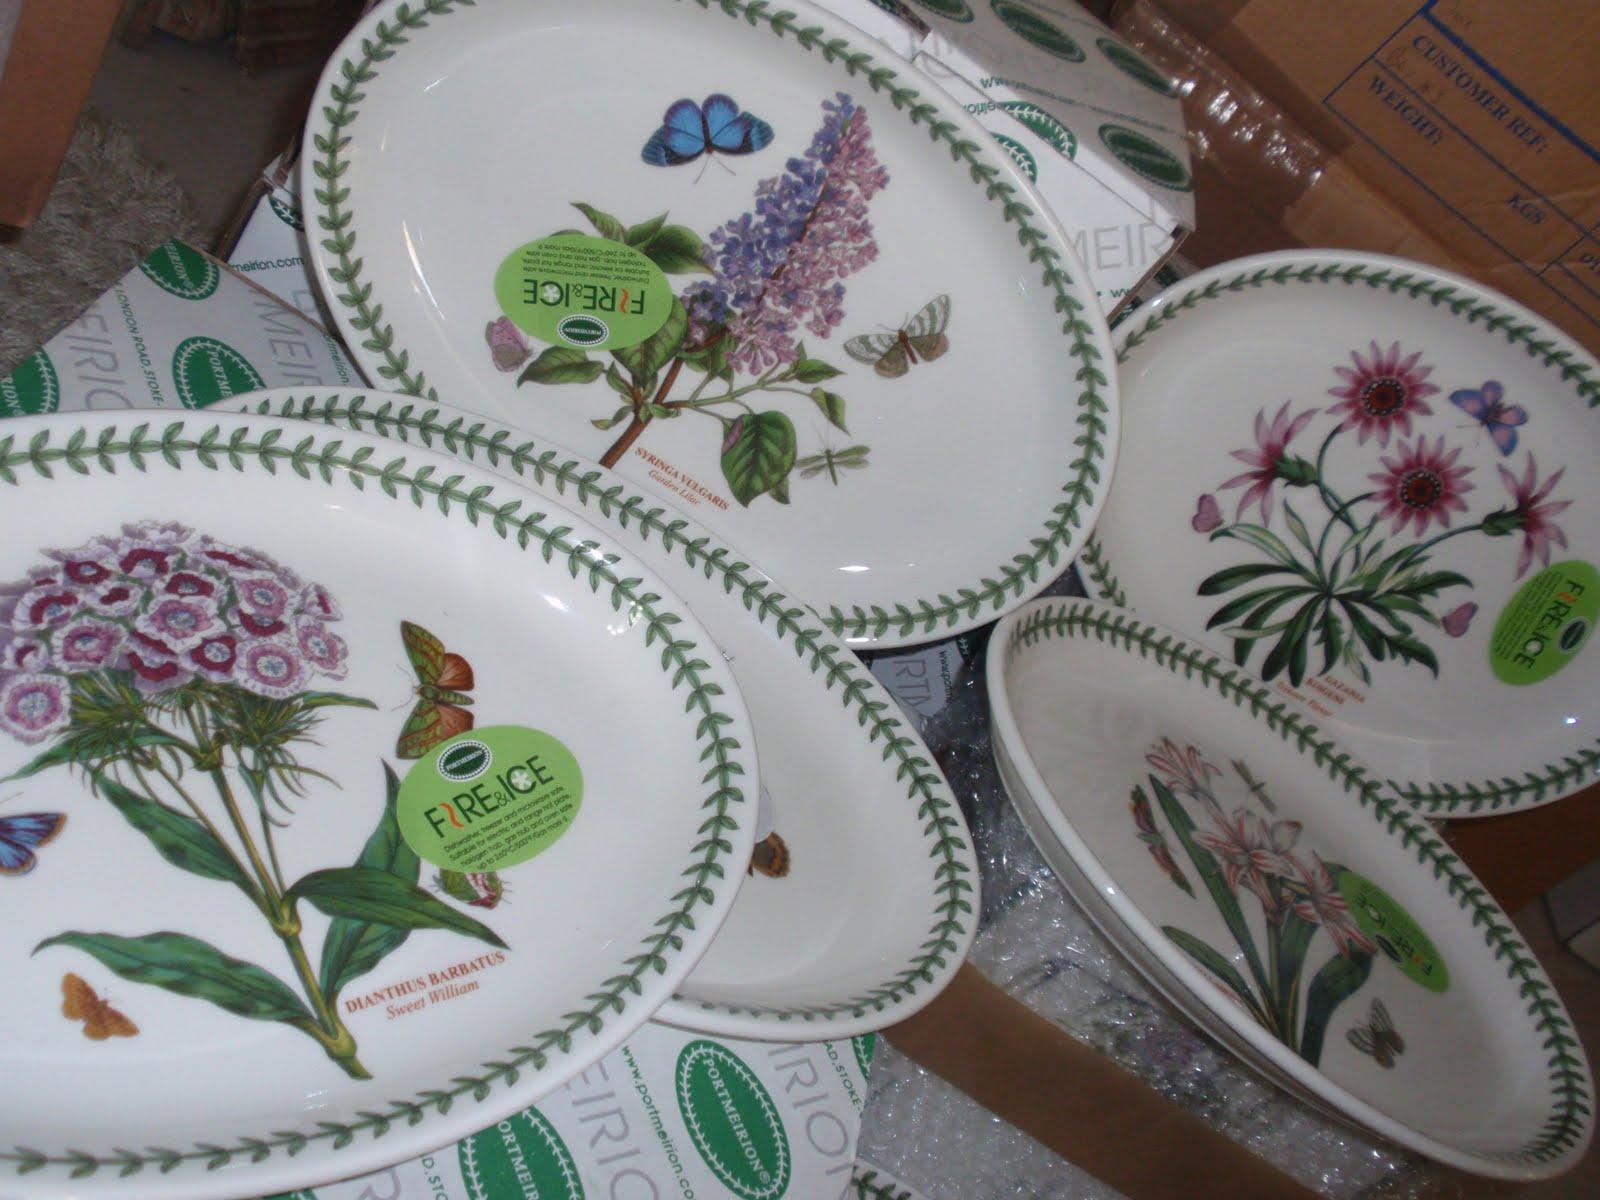 What do your everyday dishes look like mumbo jumbo gumbo for Portmeirion dinnerware set of 4 botanic garden canape plates